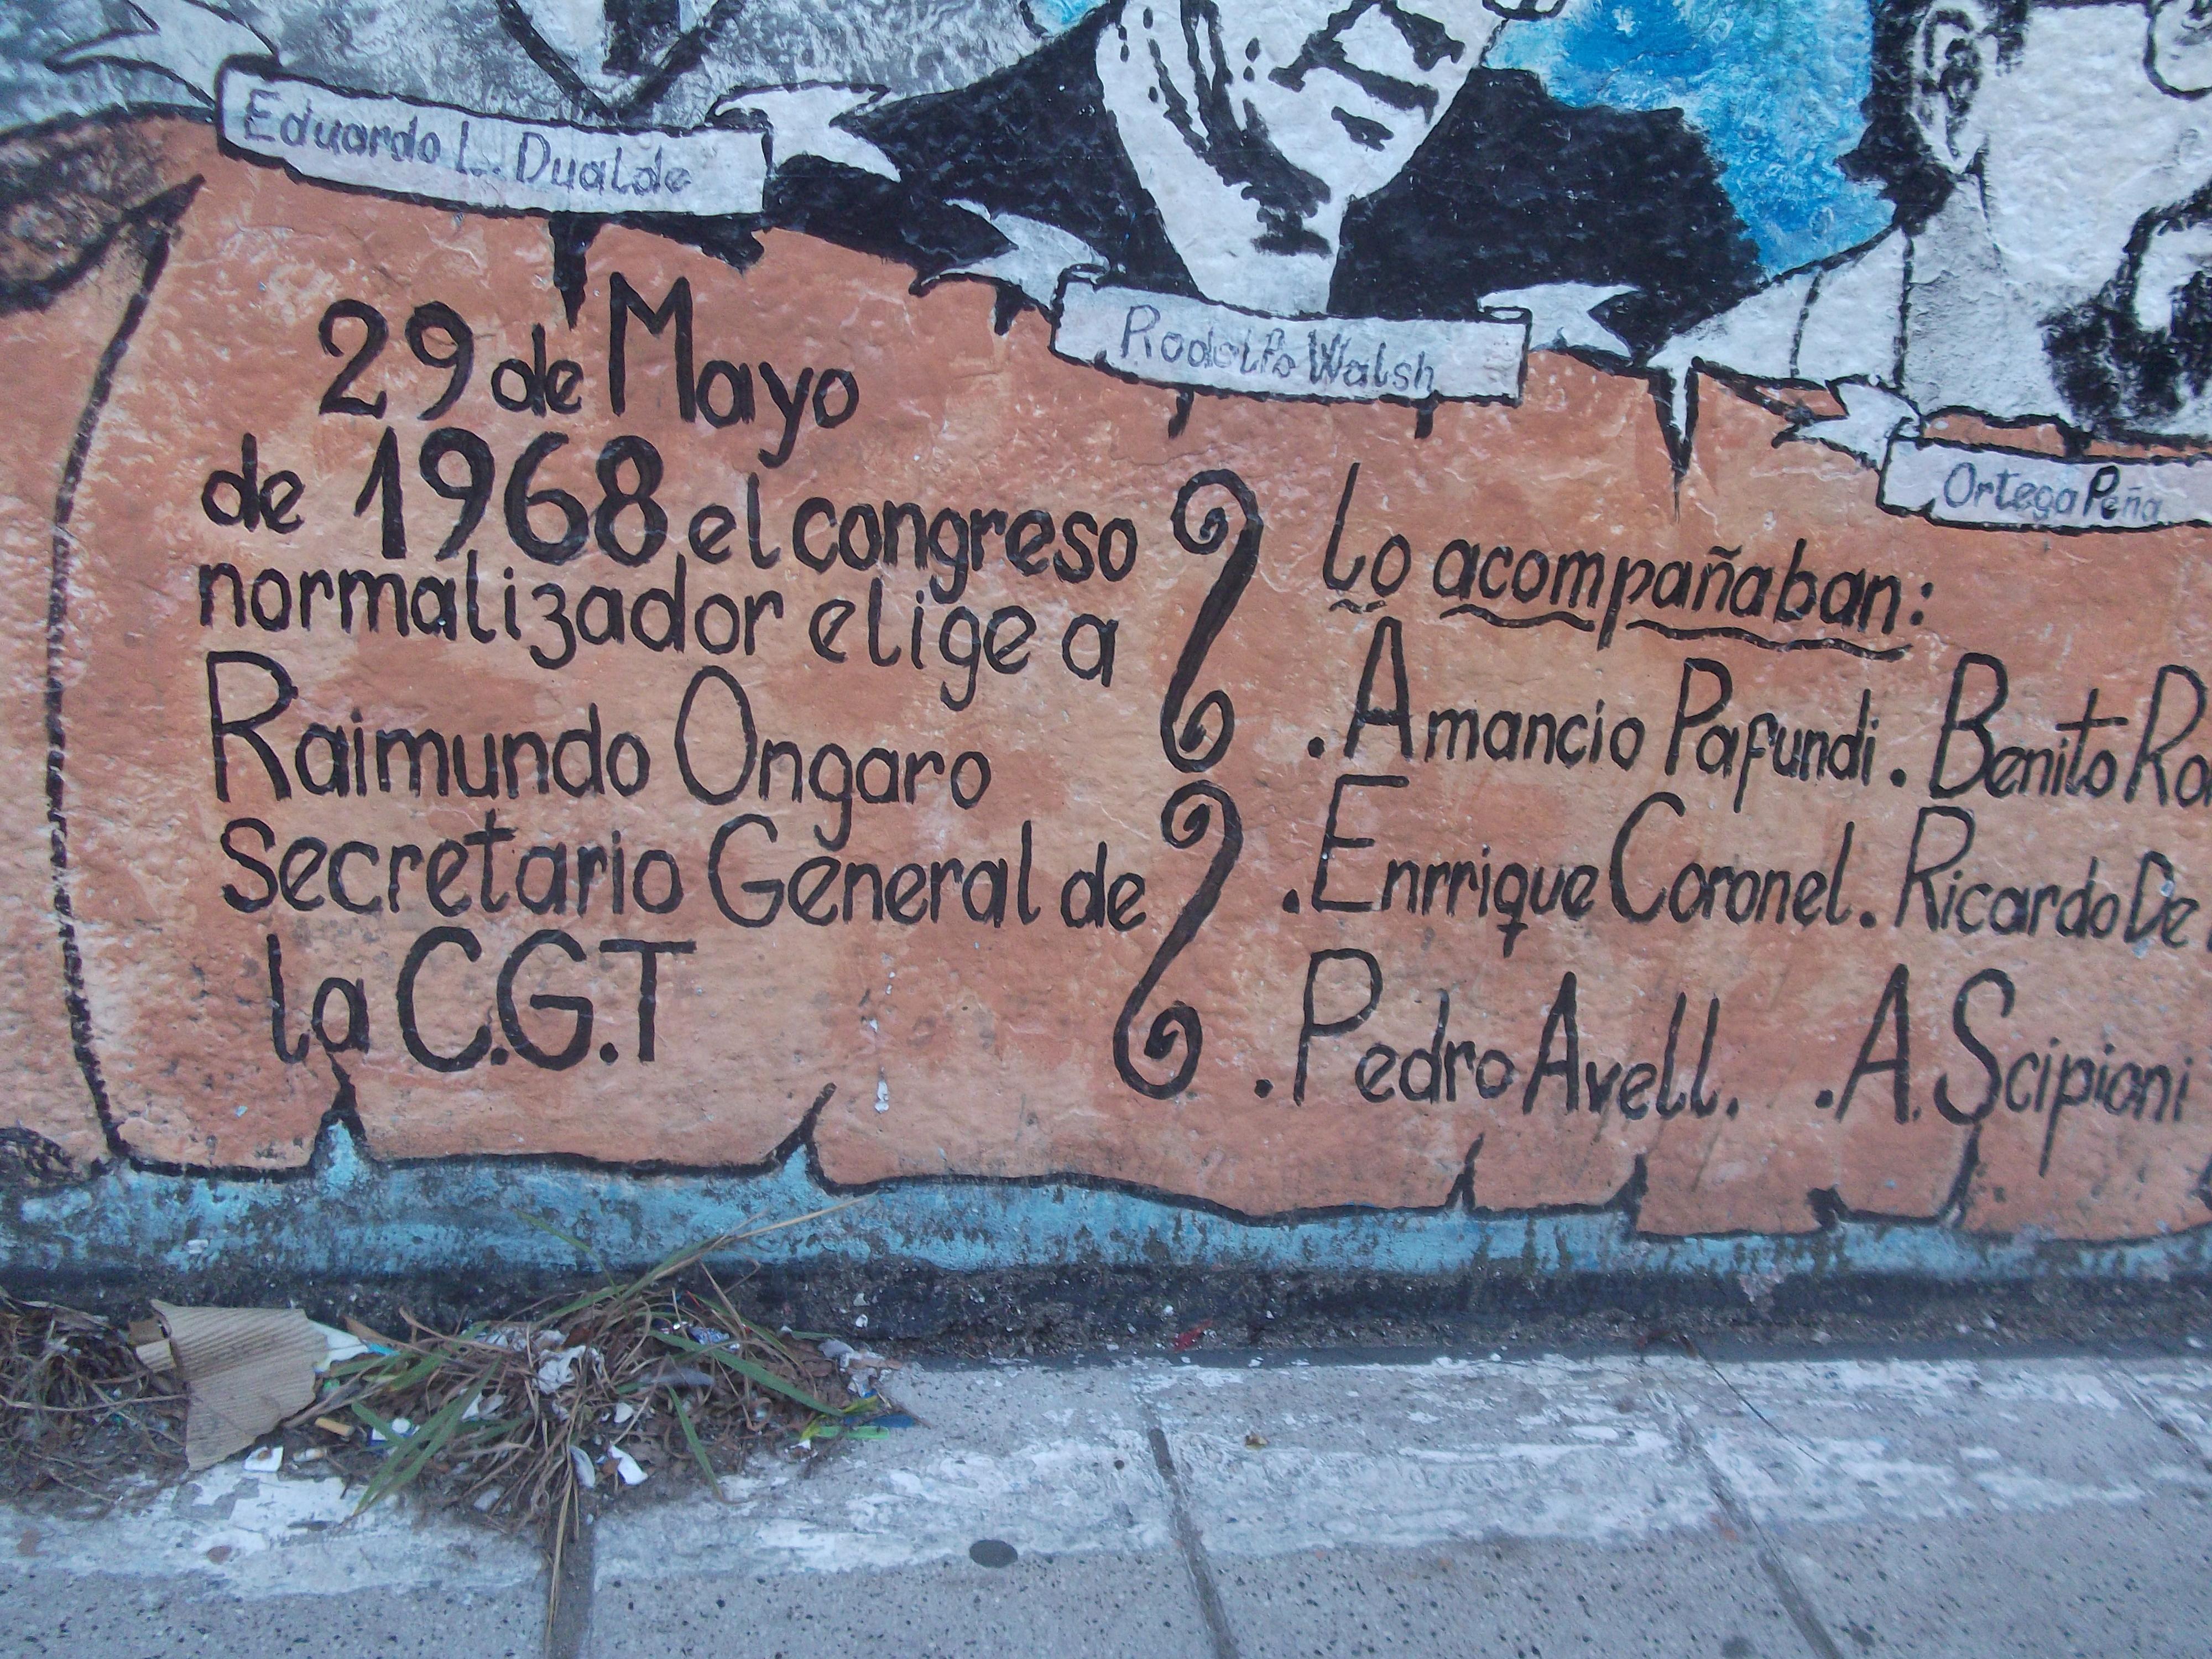 Detalles del mural - Mural en Av. Gral. Lacarra al 1500